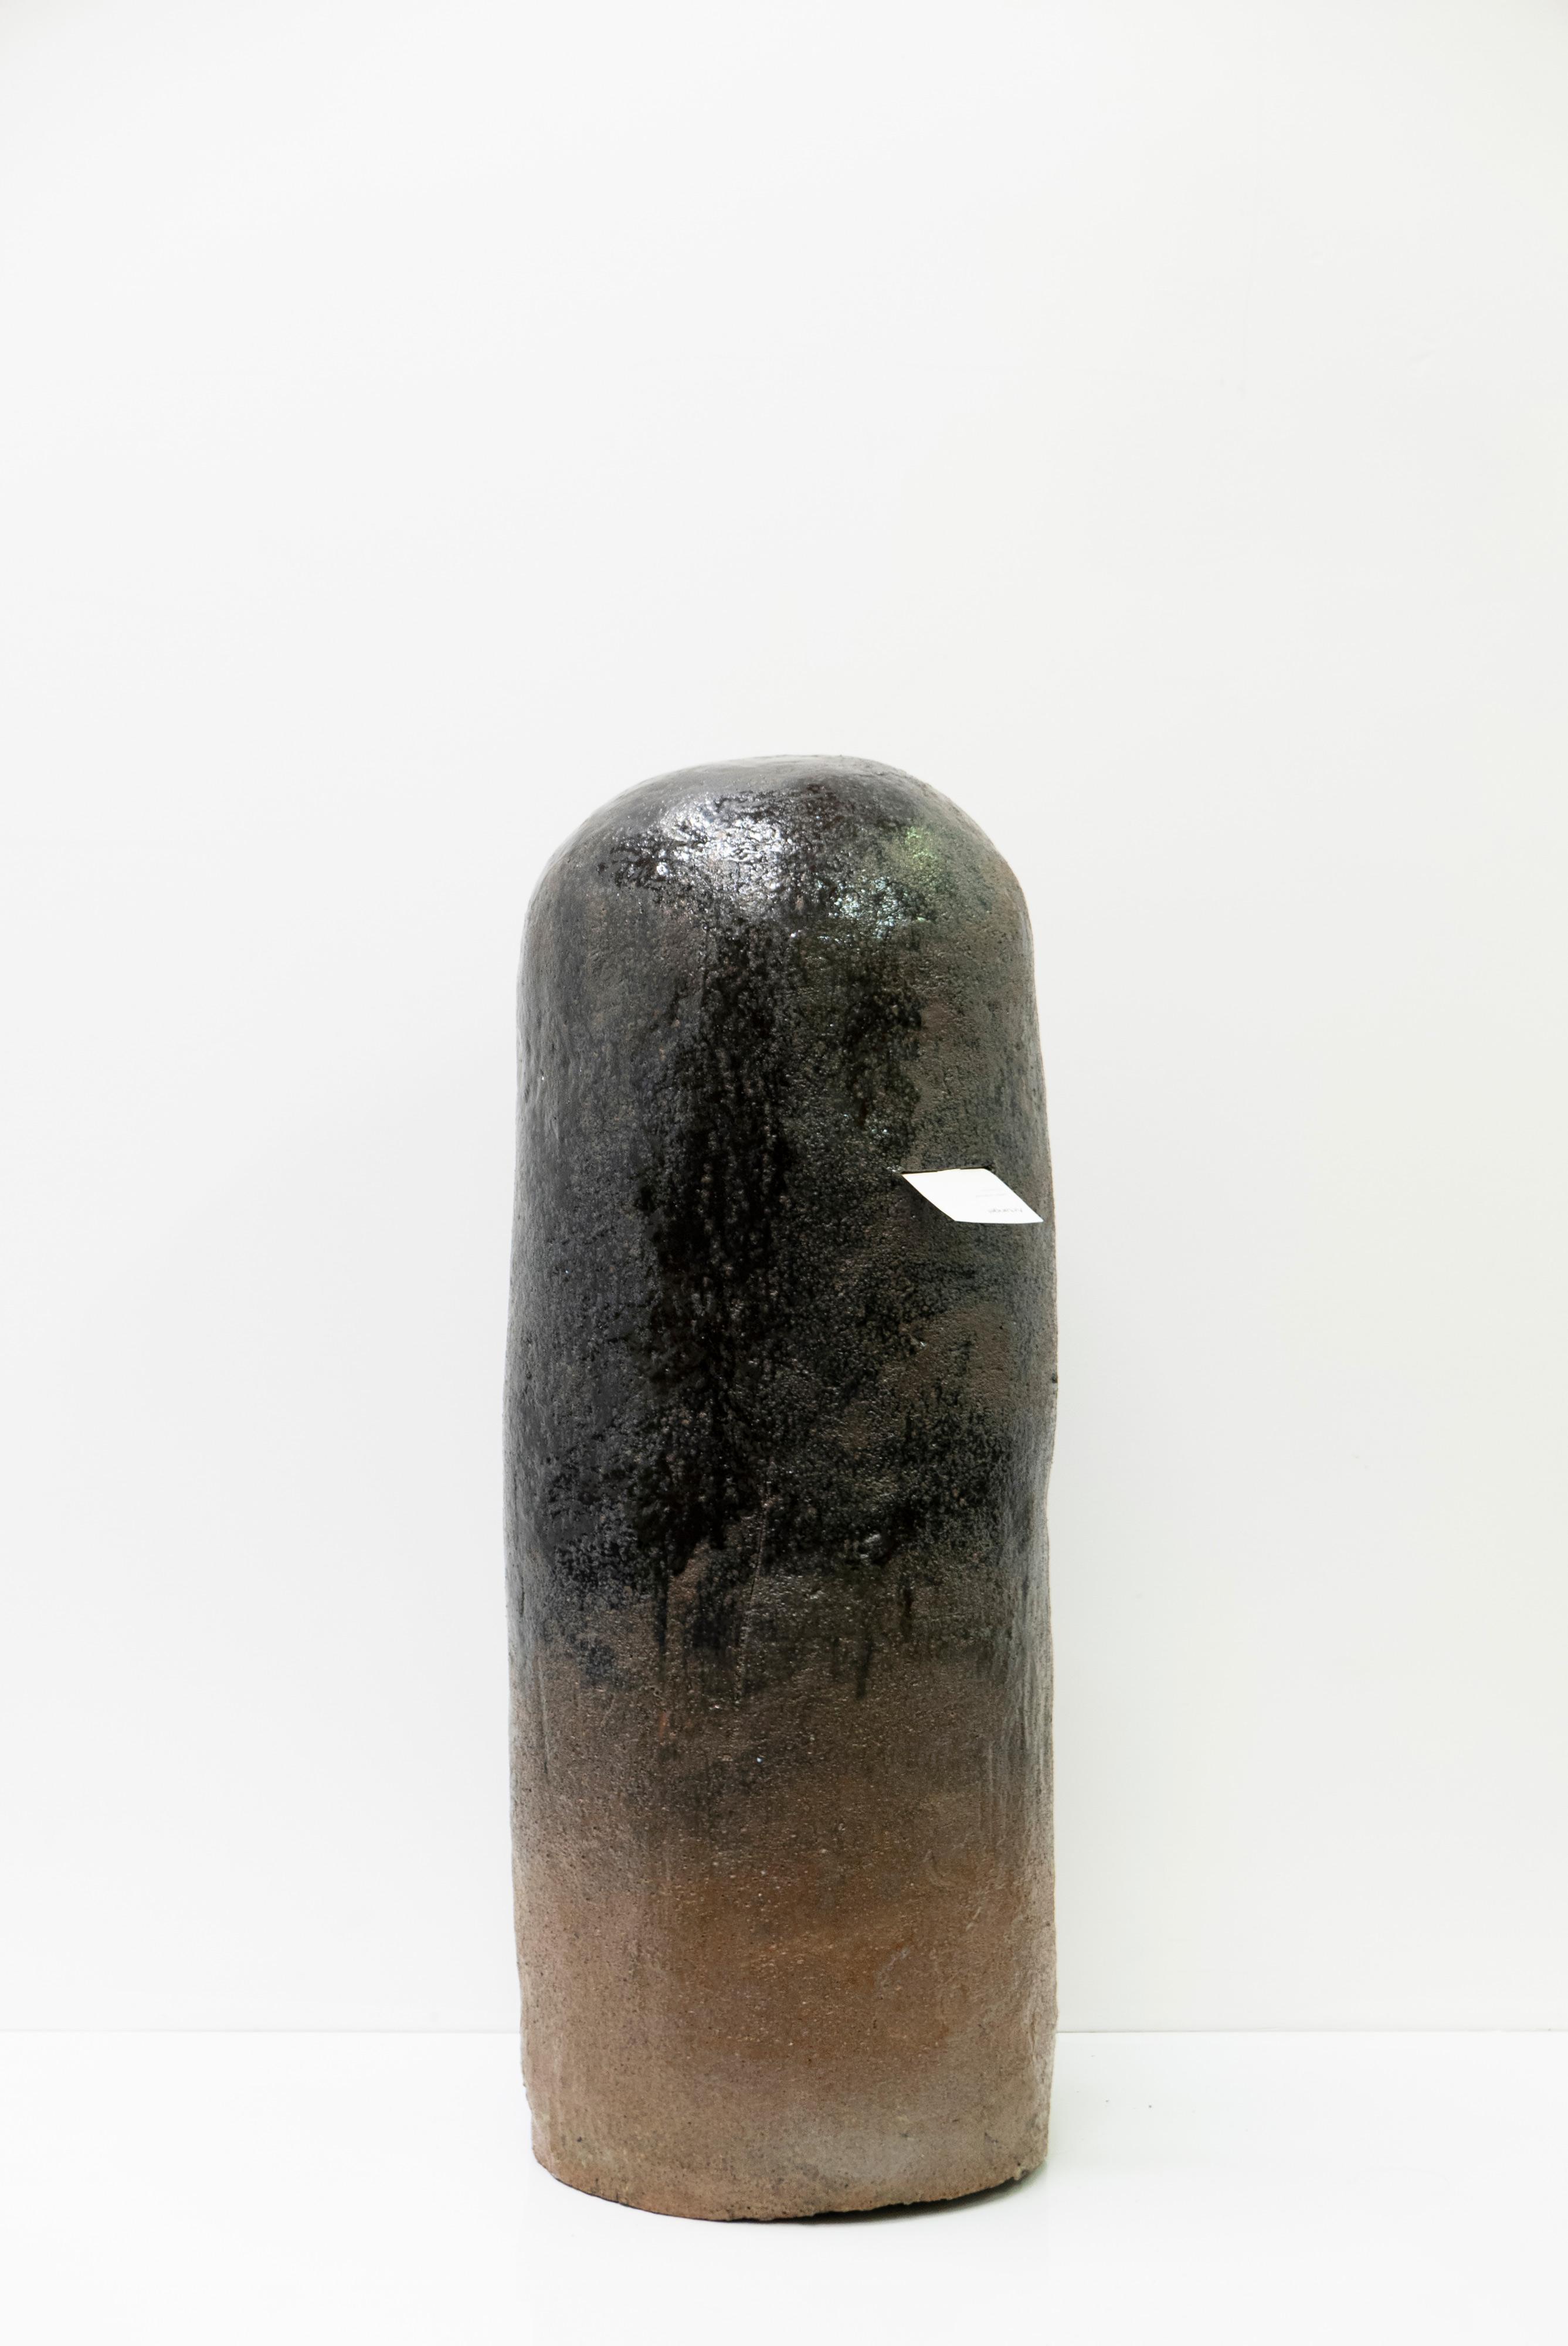 Galerie Barbara Thumm \ New Viewings #23 \ Cushla Donaldson